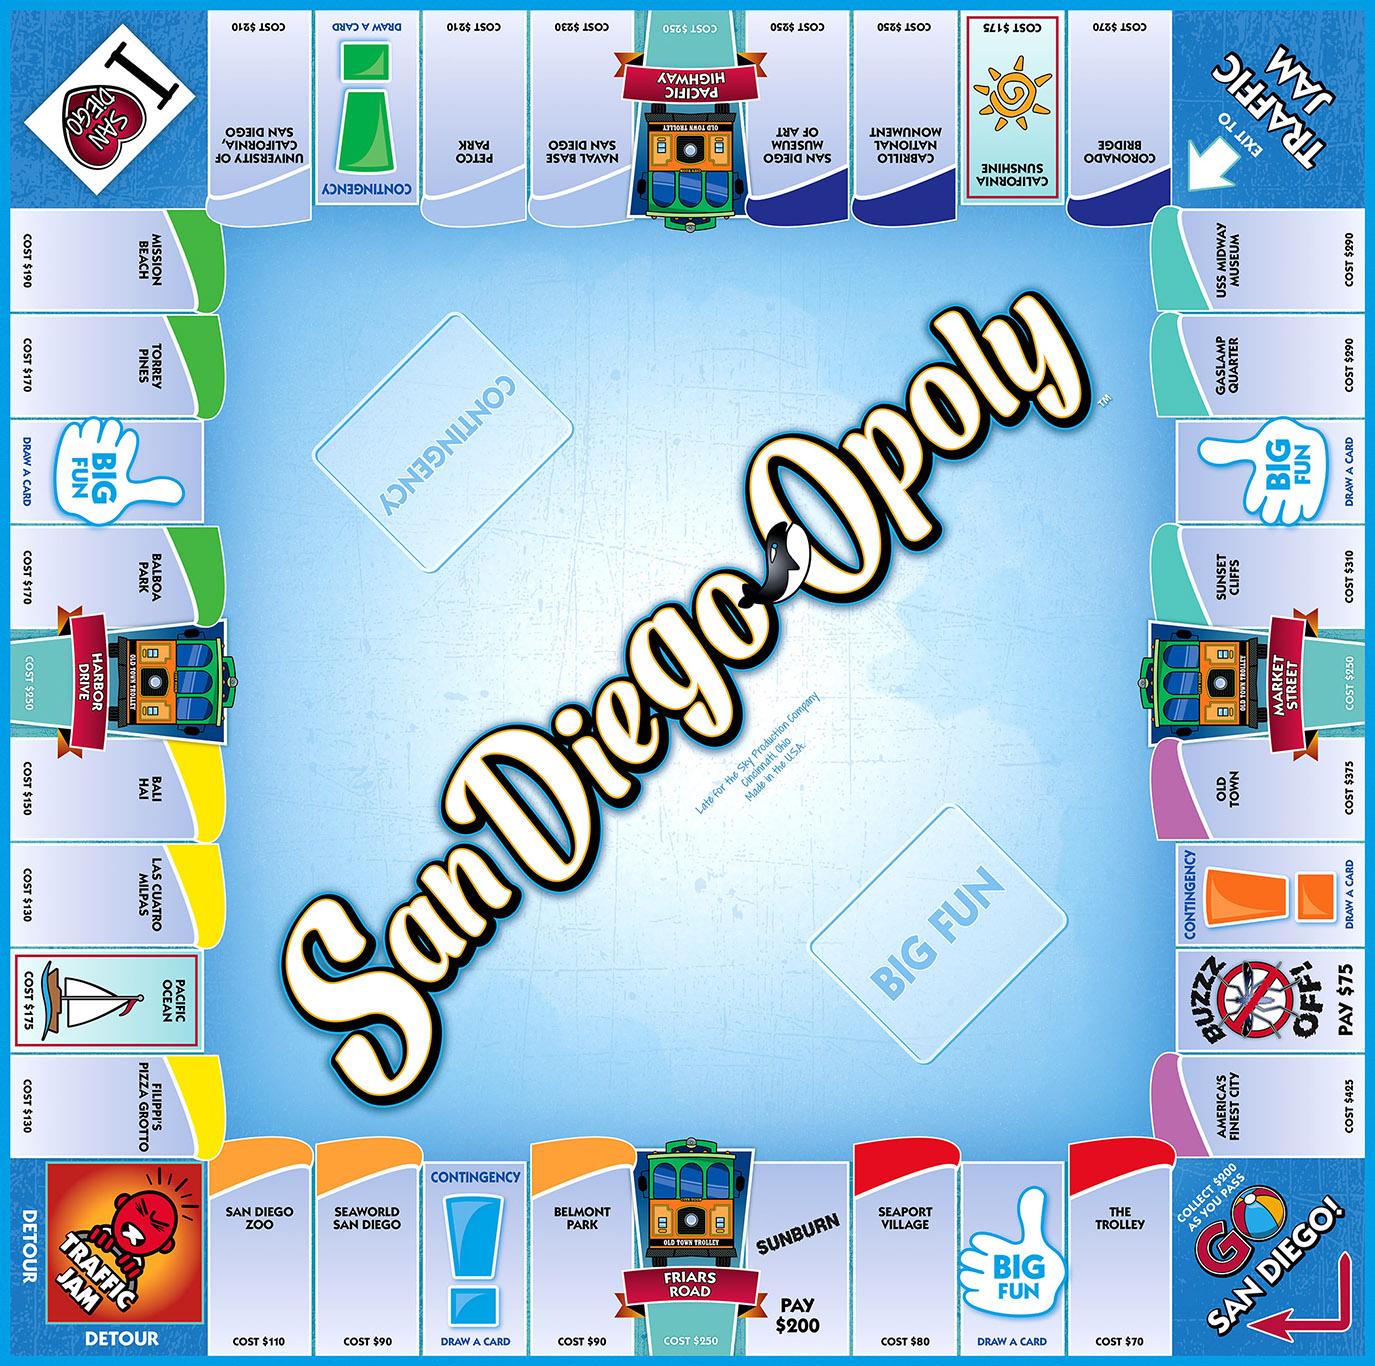 SAN DIEGO-OPOLY Board Game